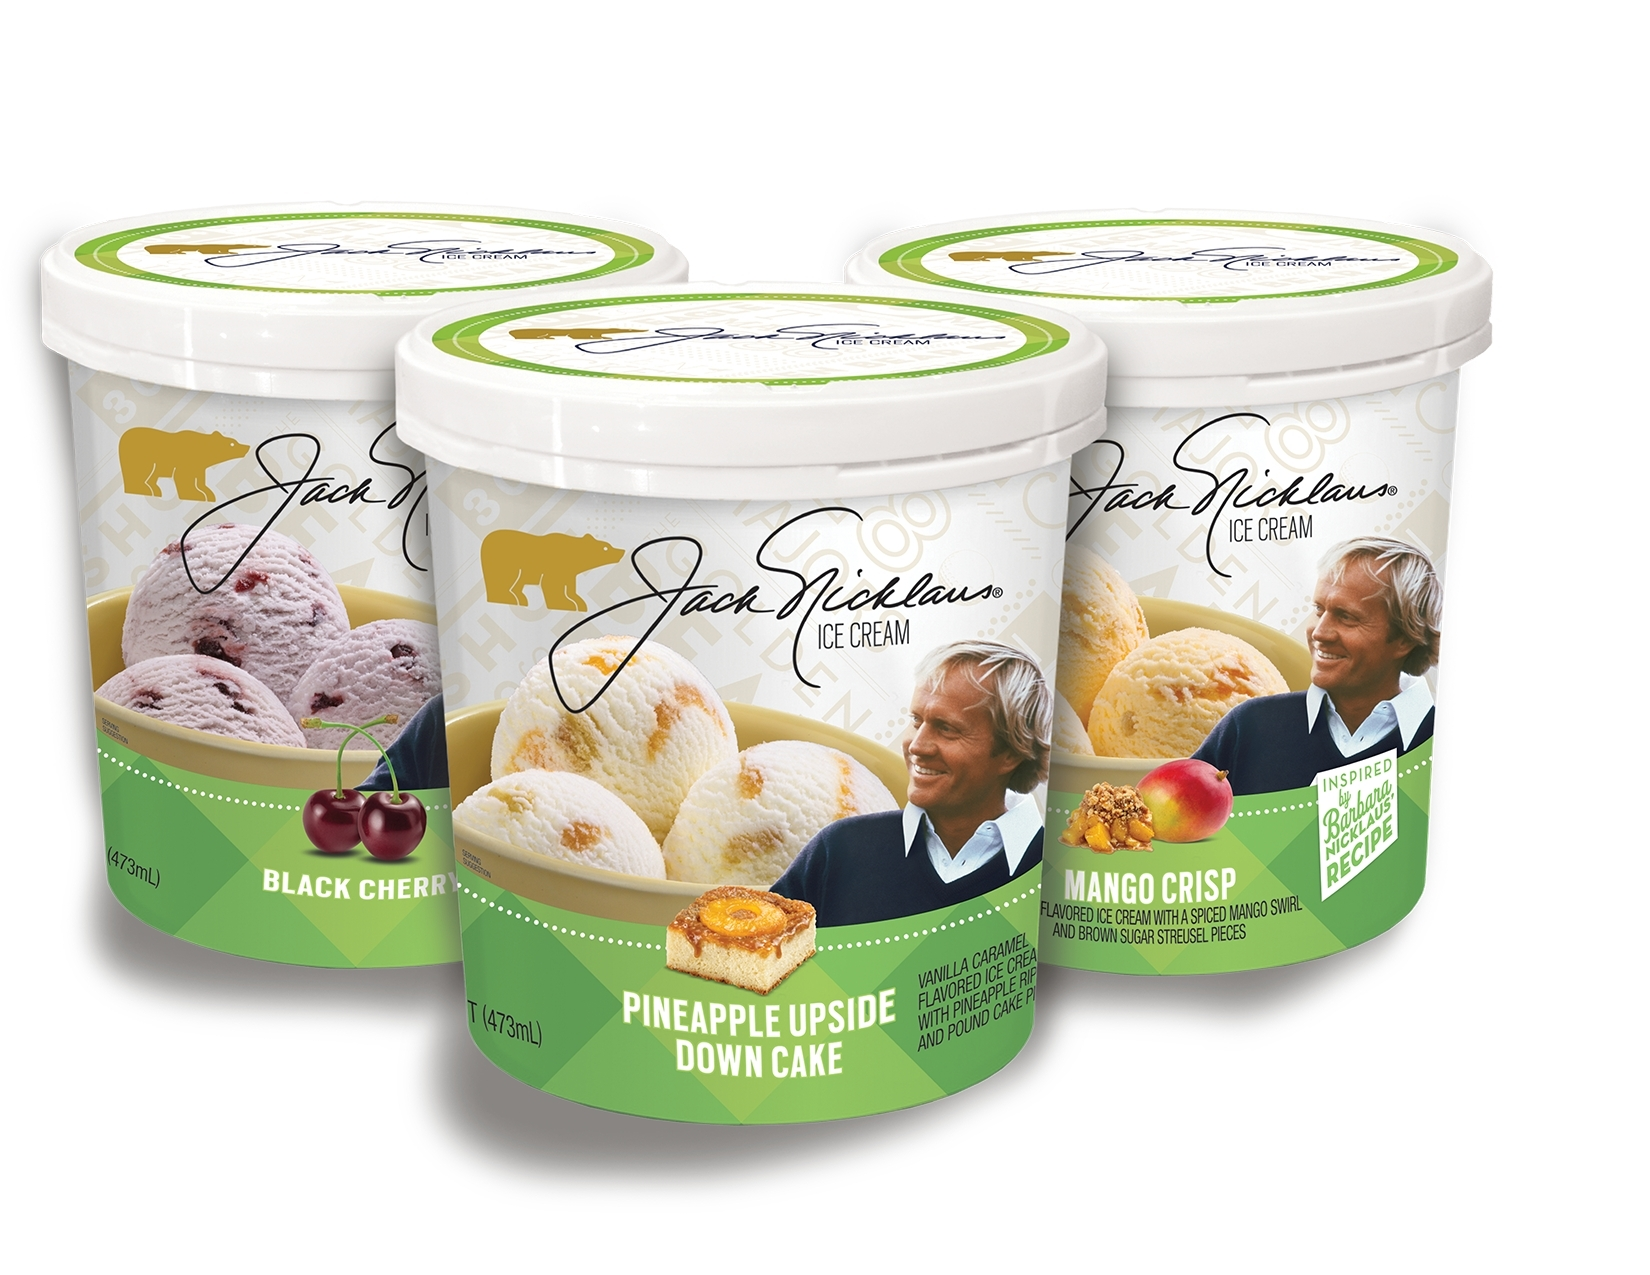 Jack Nicklaus Ice Cream Celebrates One-Year Anniversary with New